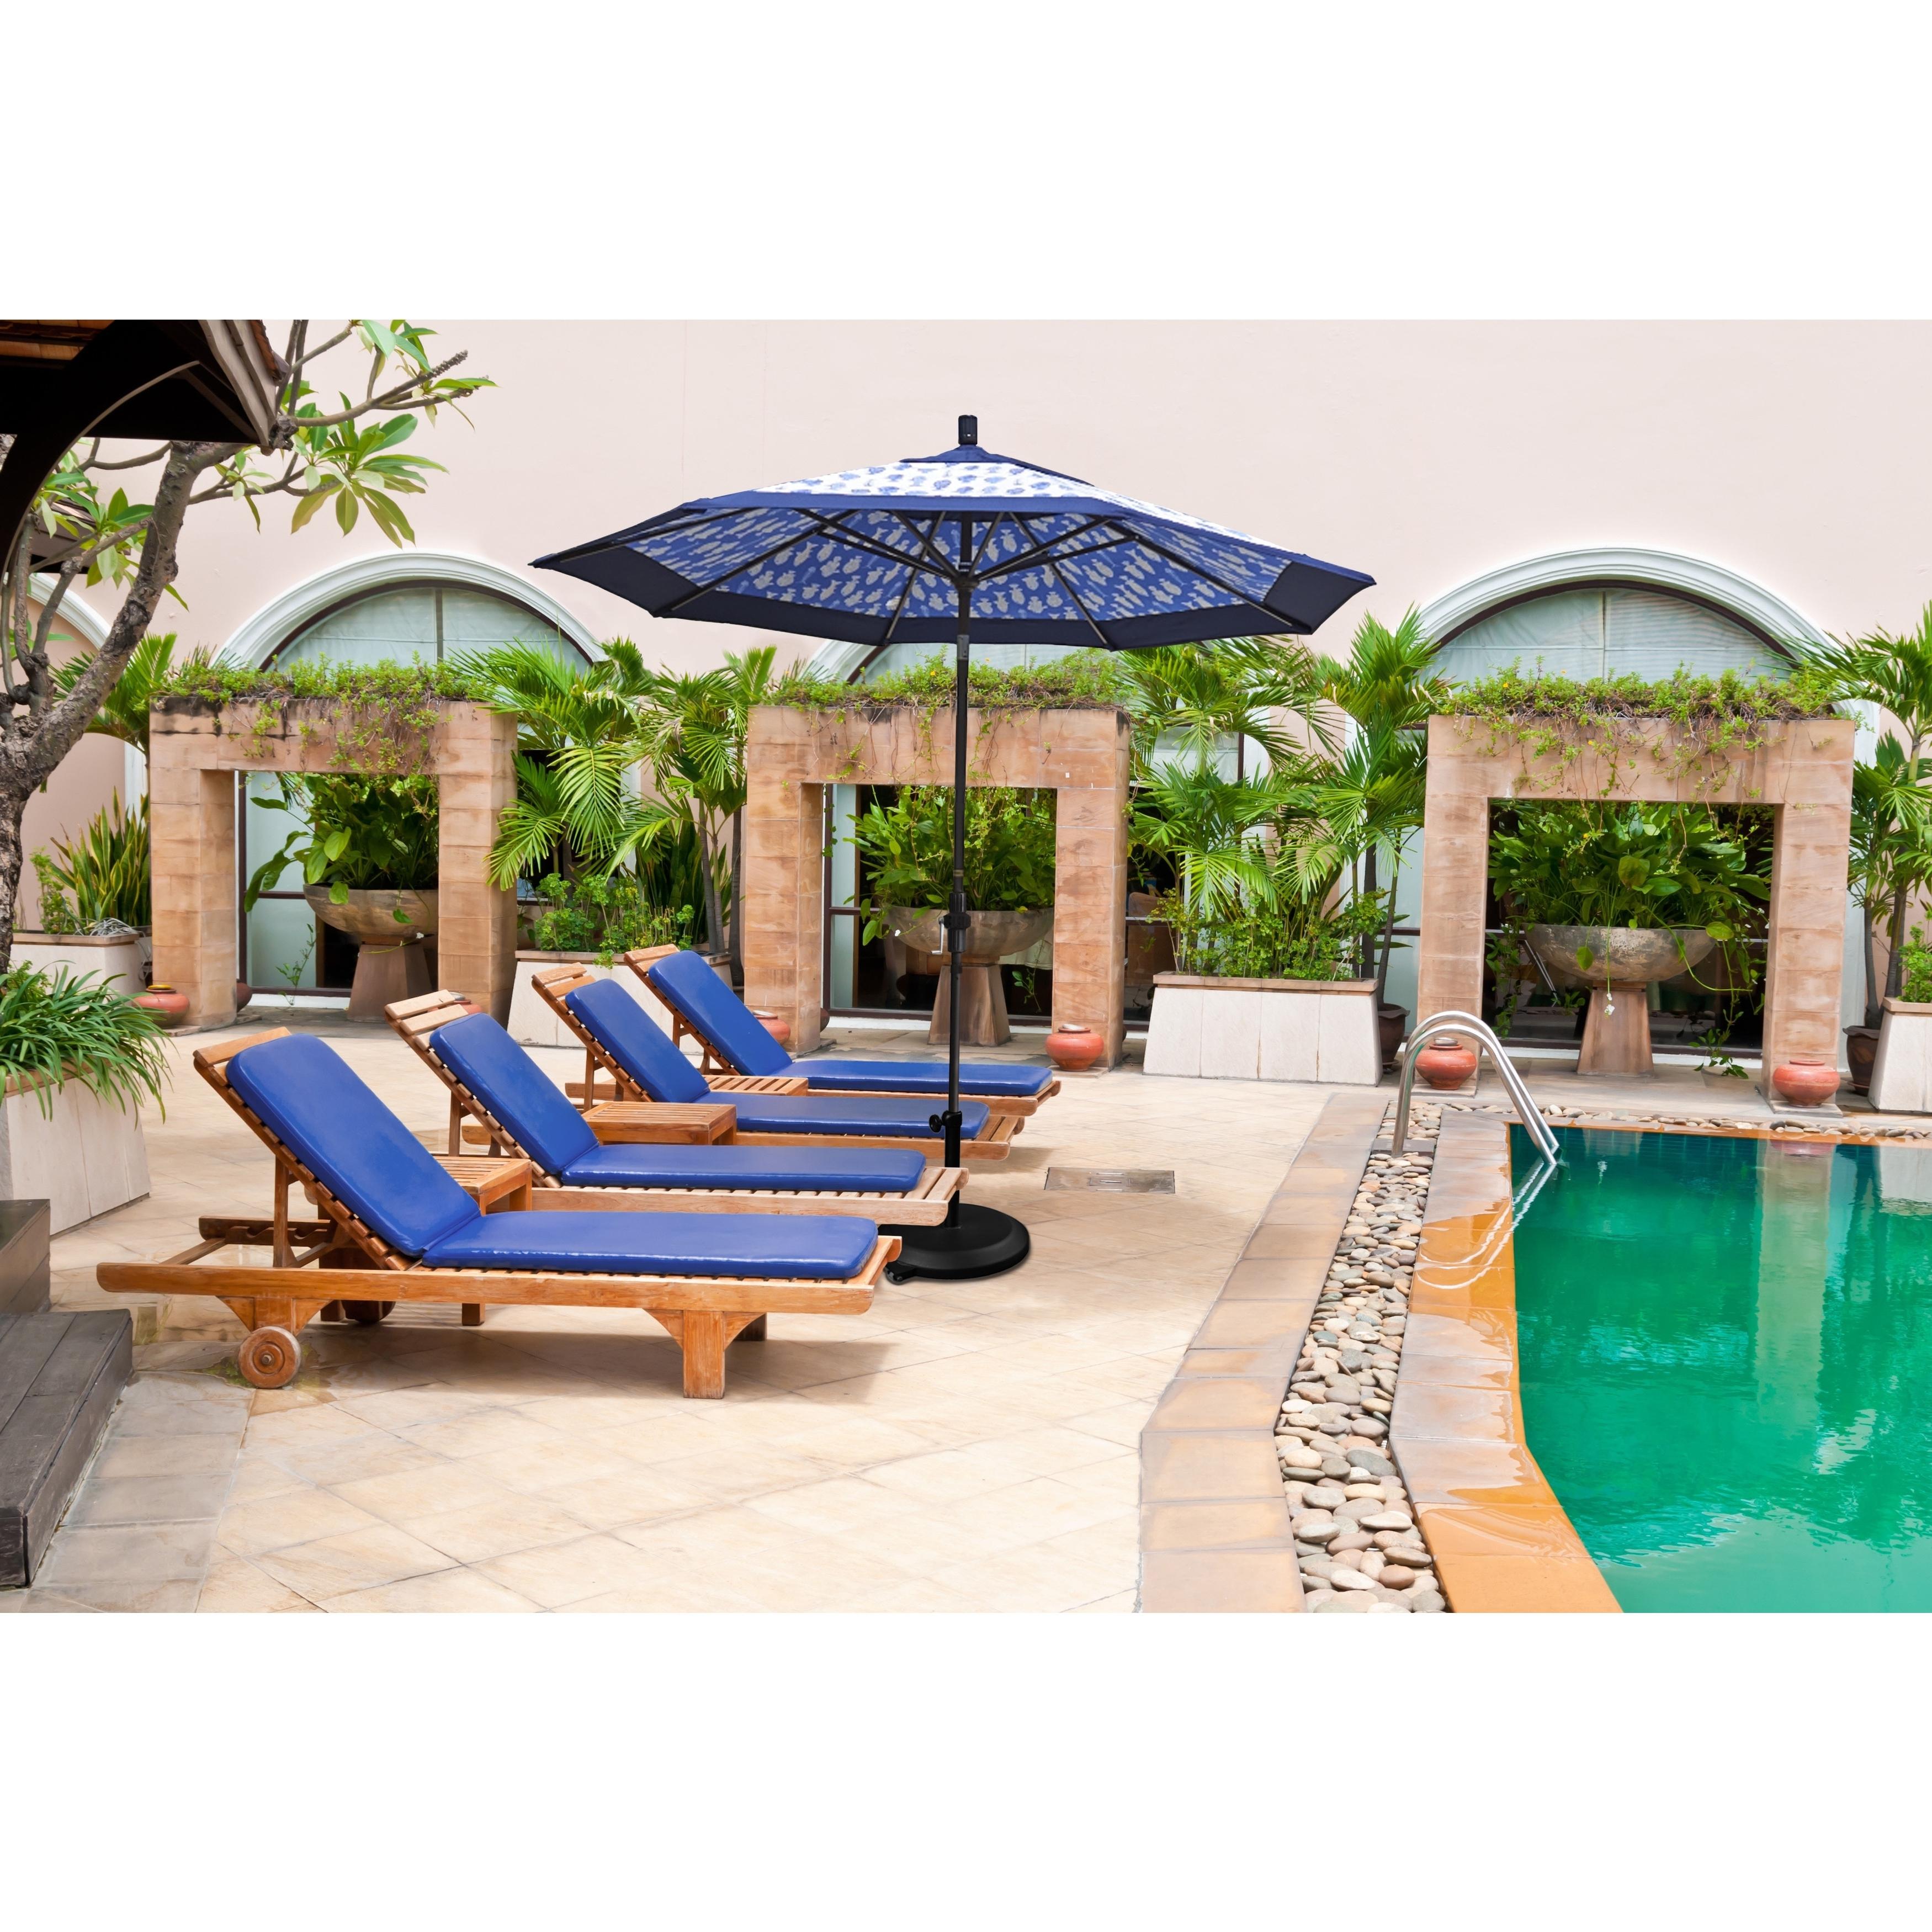 Patio Umbrellas With Sunbrella Fabric In Well Liked Shop California Umbrella 11' Rd (View 18 of 20)